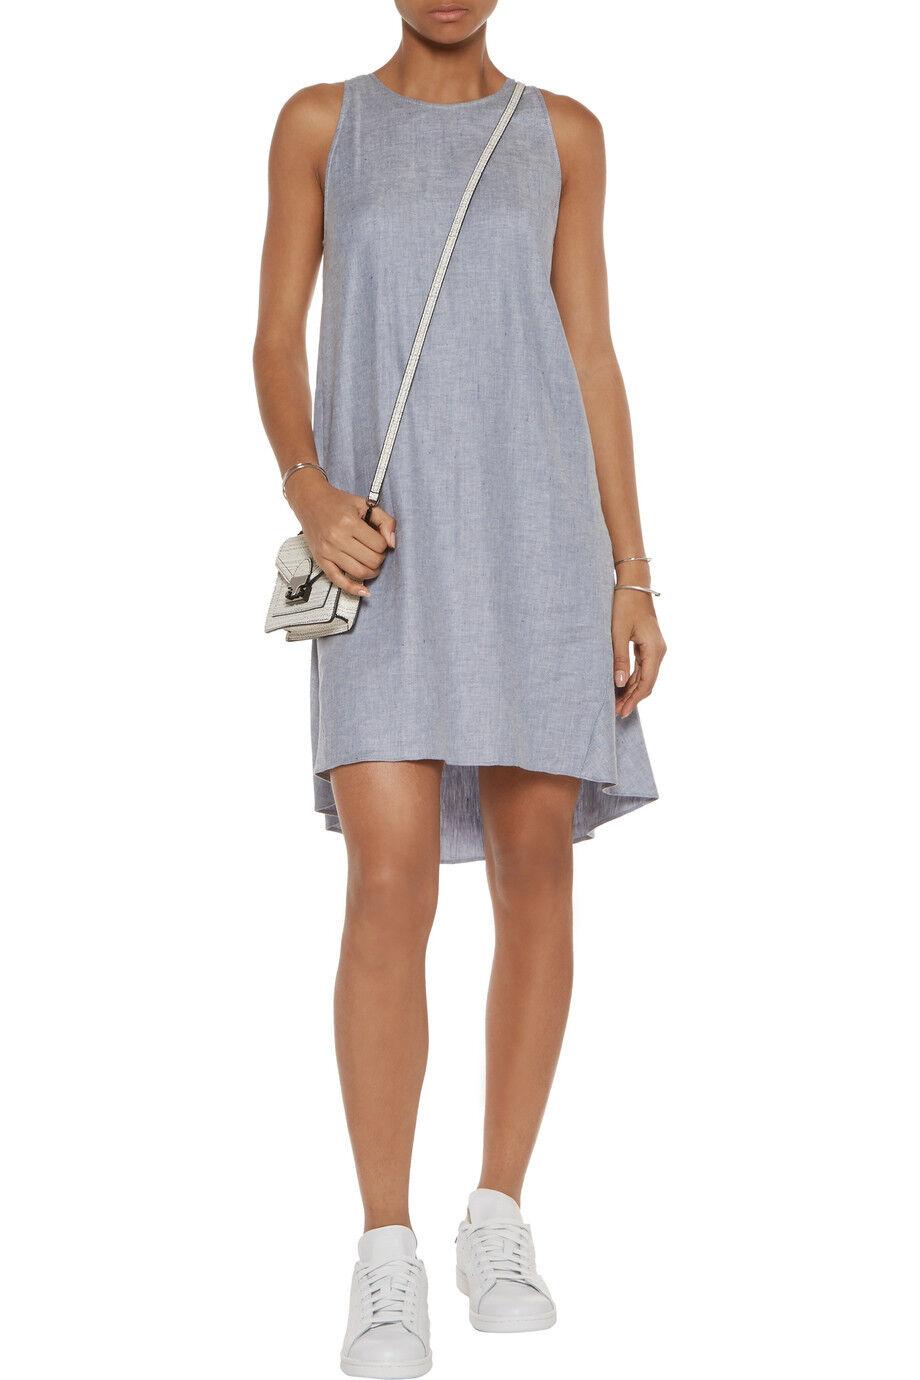 THEORY Adlerdale Light Grey Tierra Linen Blend High Low Dress Size 8 NWT $325